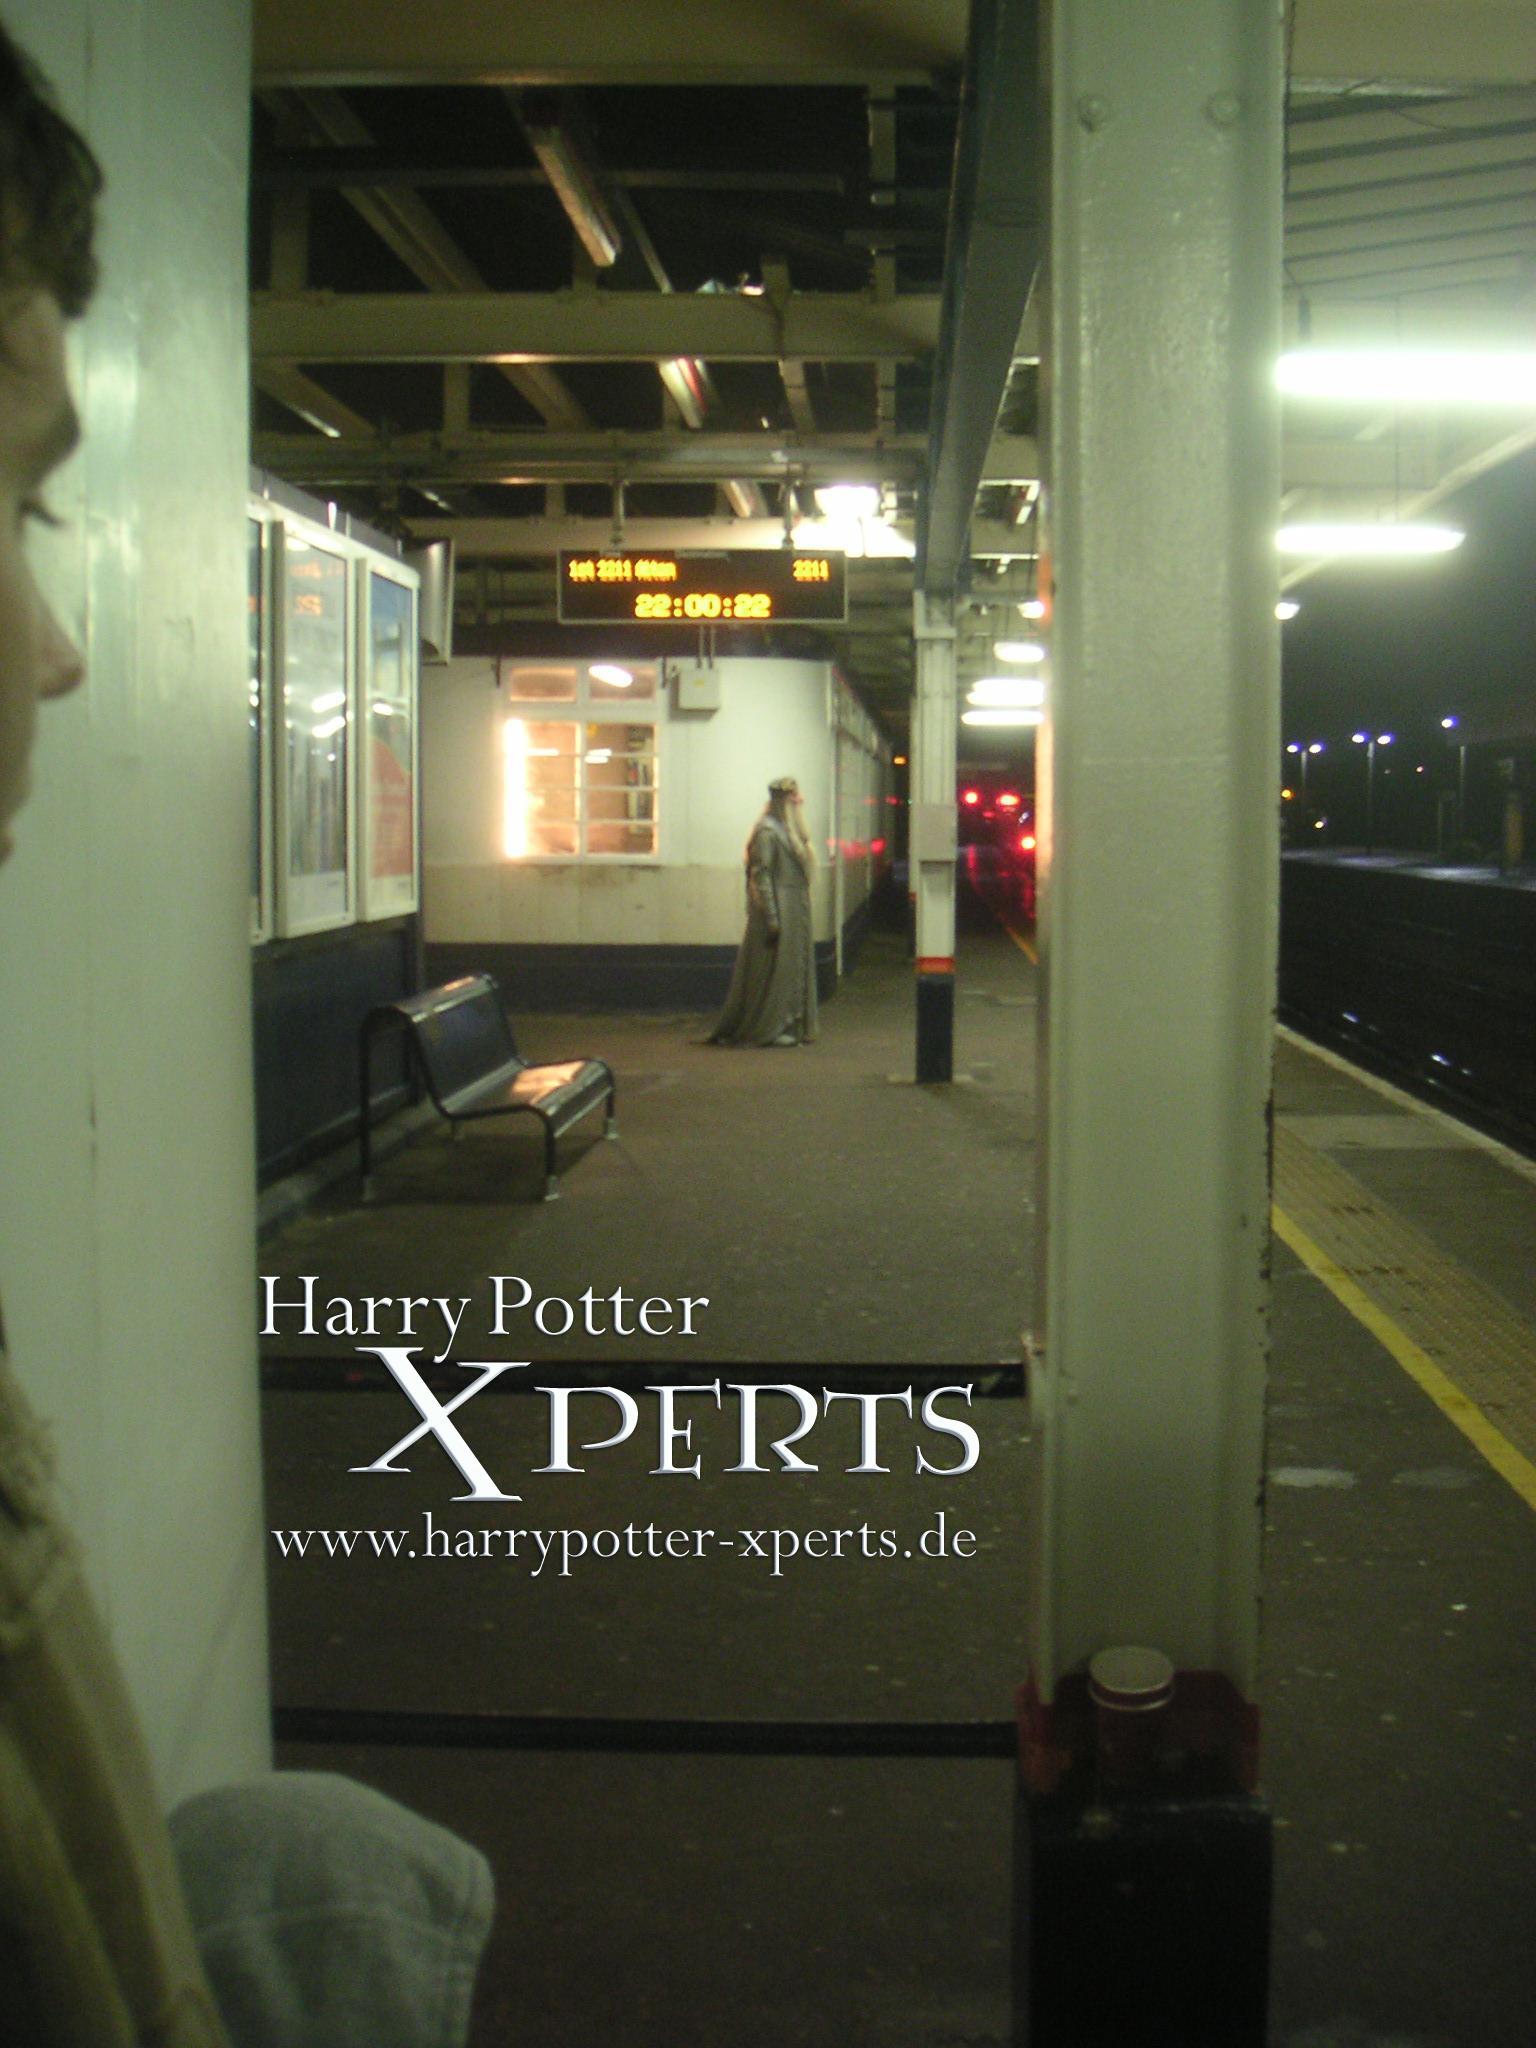 Dumbledore... ¿esperando el tren?